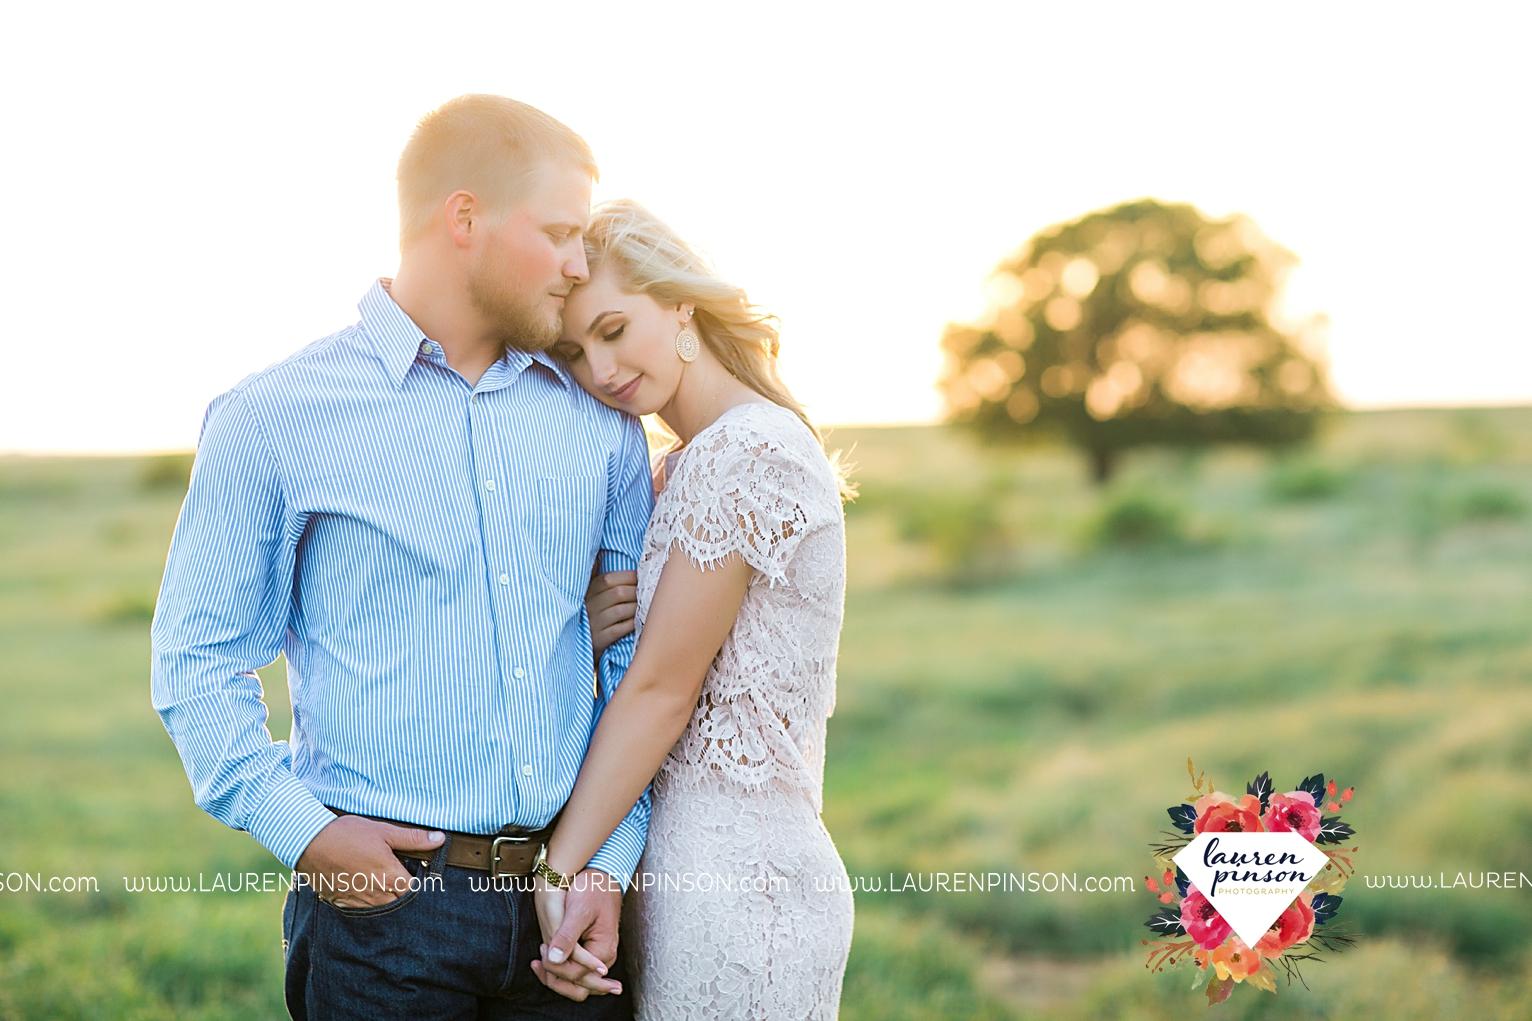 wichita-falls-texas-wedding-photographer-scotland-texas-engagement-session-country-barn-field-windthorst_2770.jpg